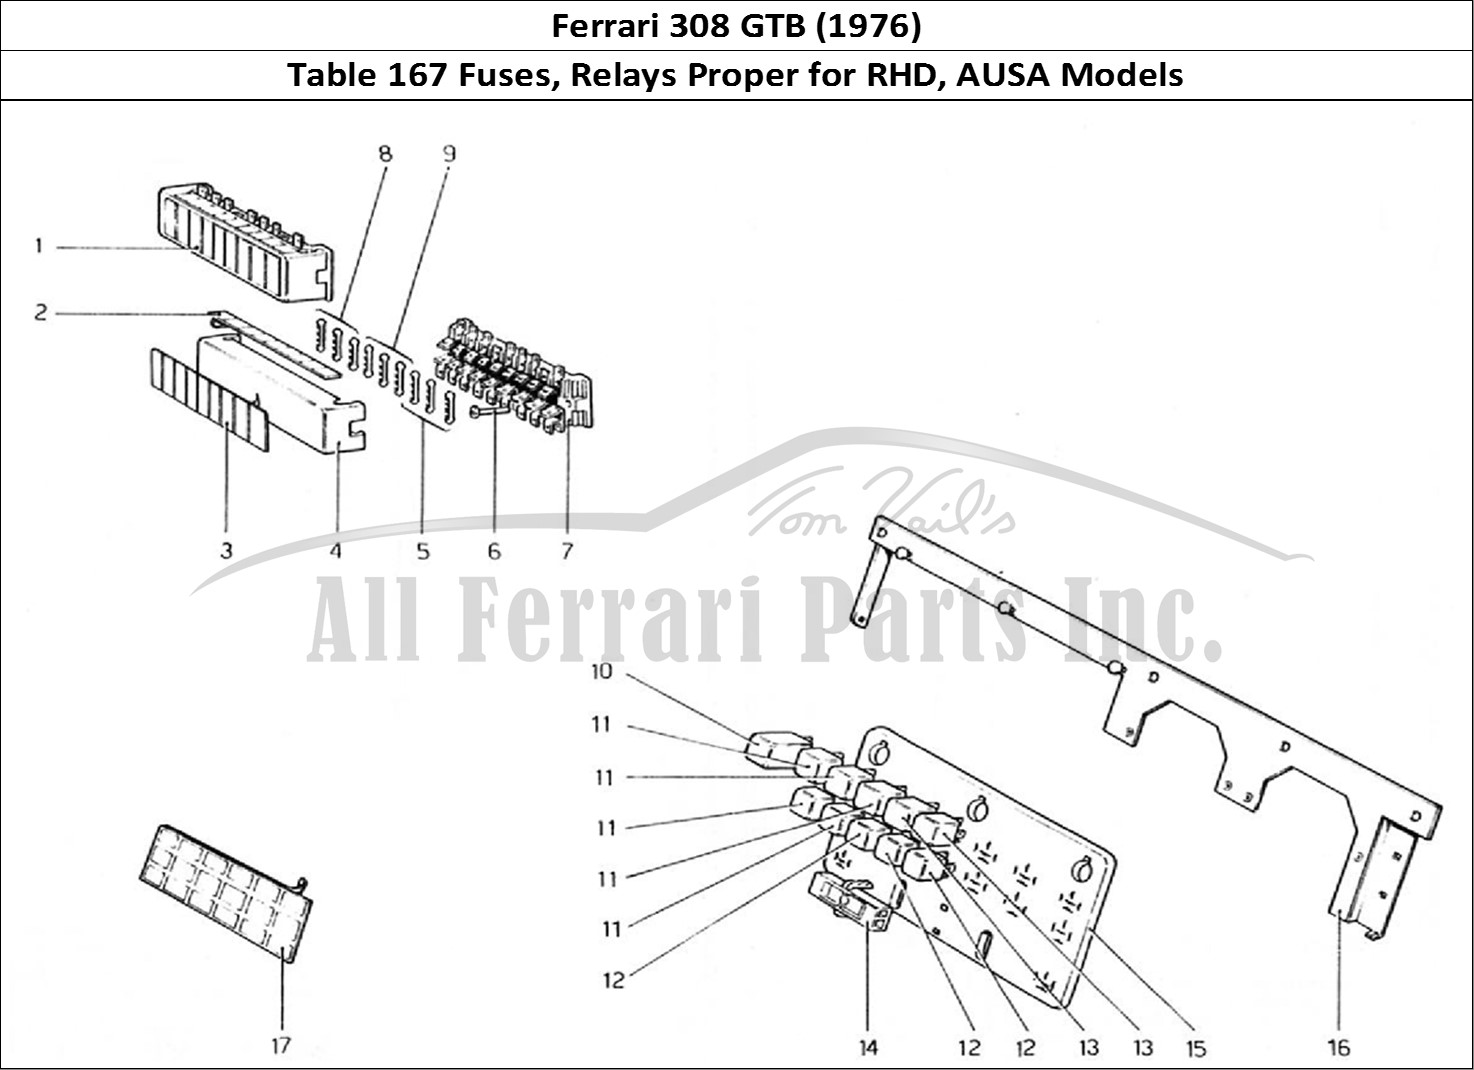 Buy original Ferrari 308 GTB (1976) 167 Fuses, Relays